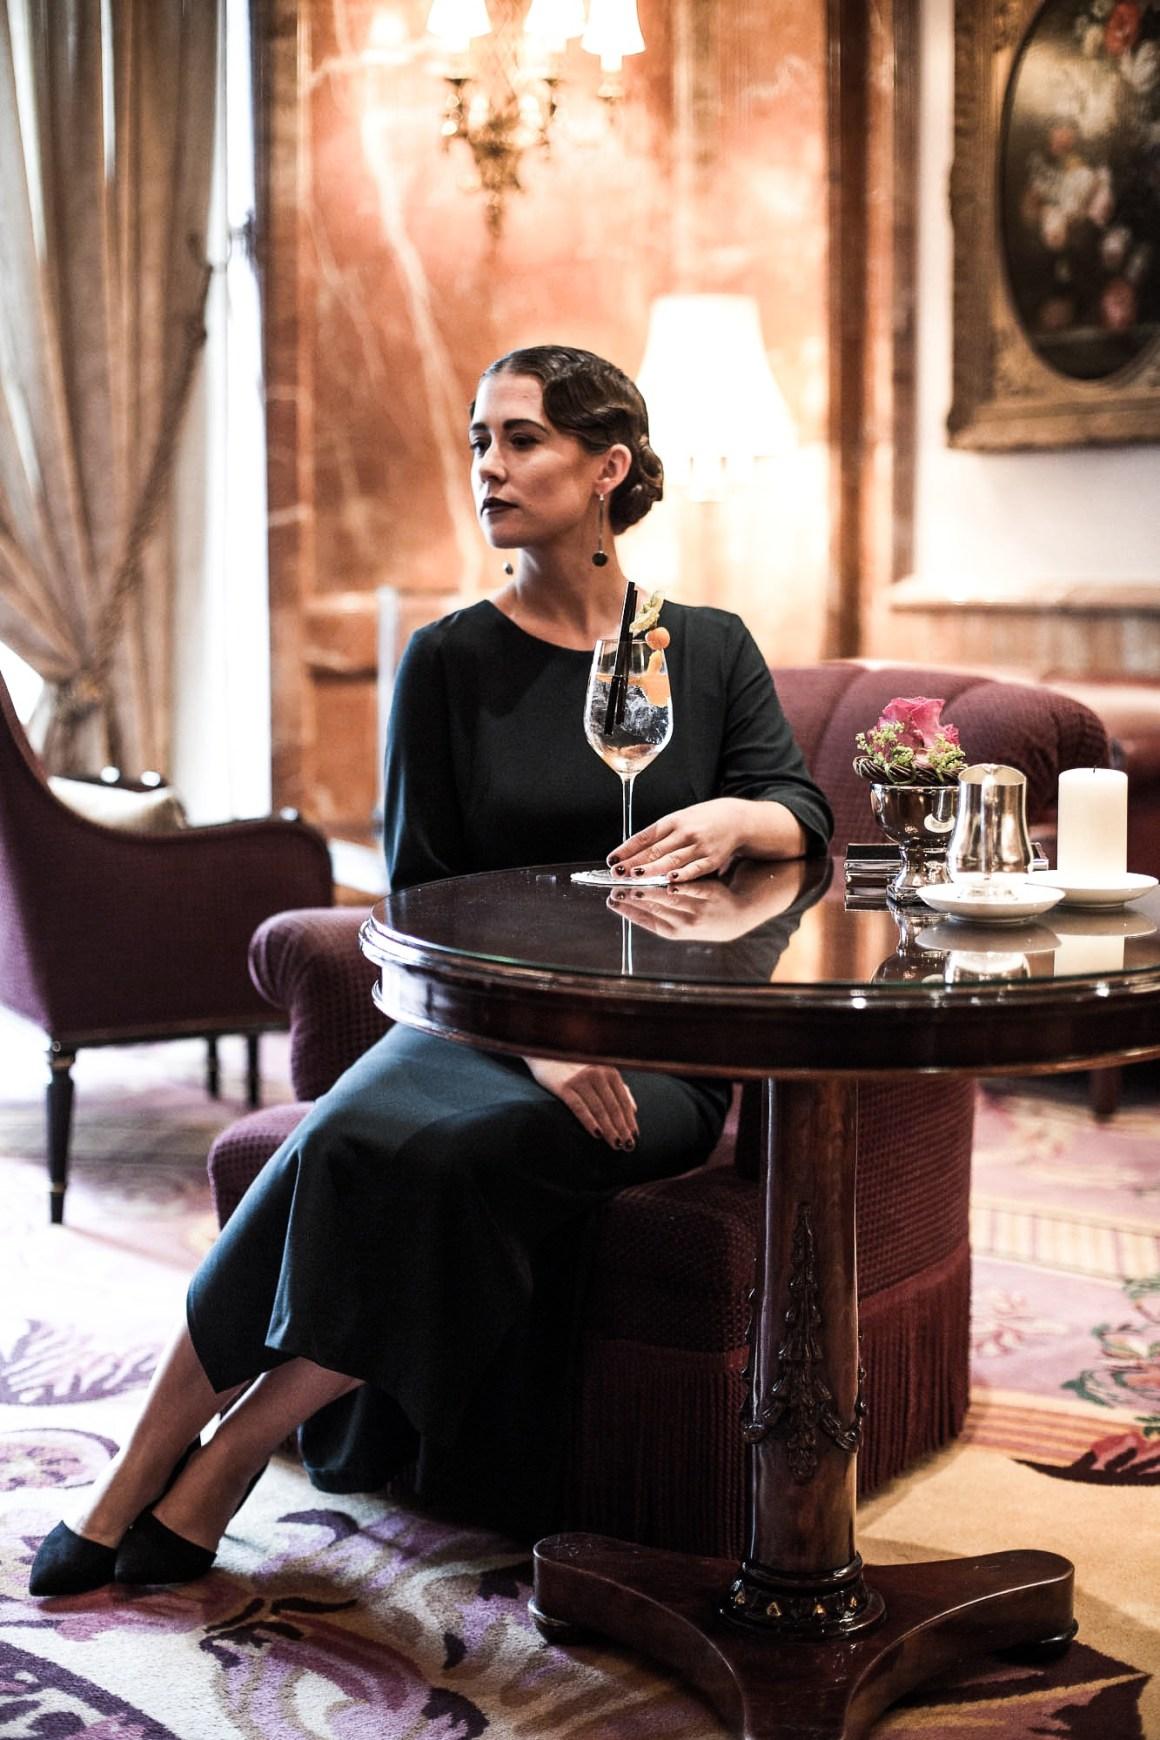 allthatchoices-fashionblogger-fashionblog-sistermag-70er-wallis-simpson-lillet-wasserwelle-kleid-regent-hotel-berlin